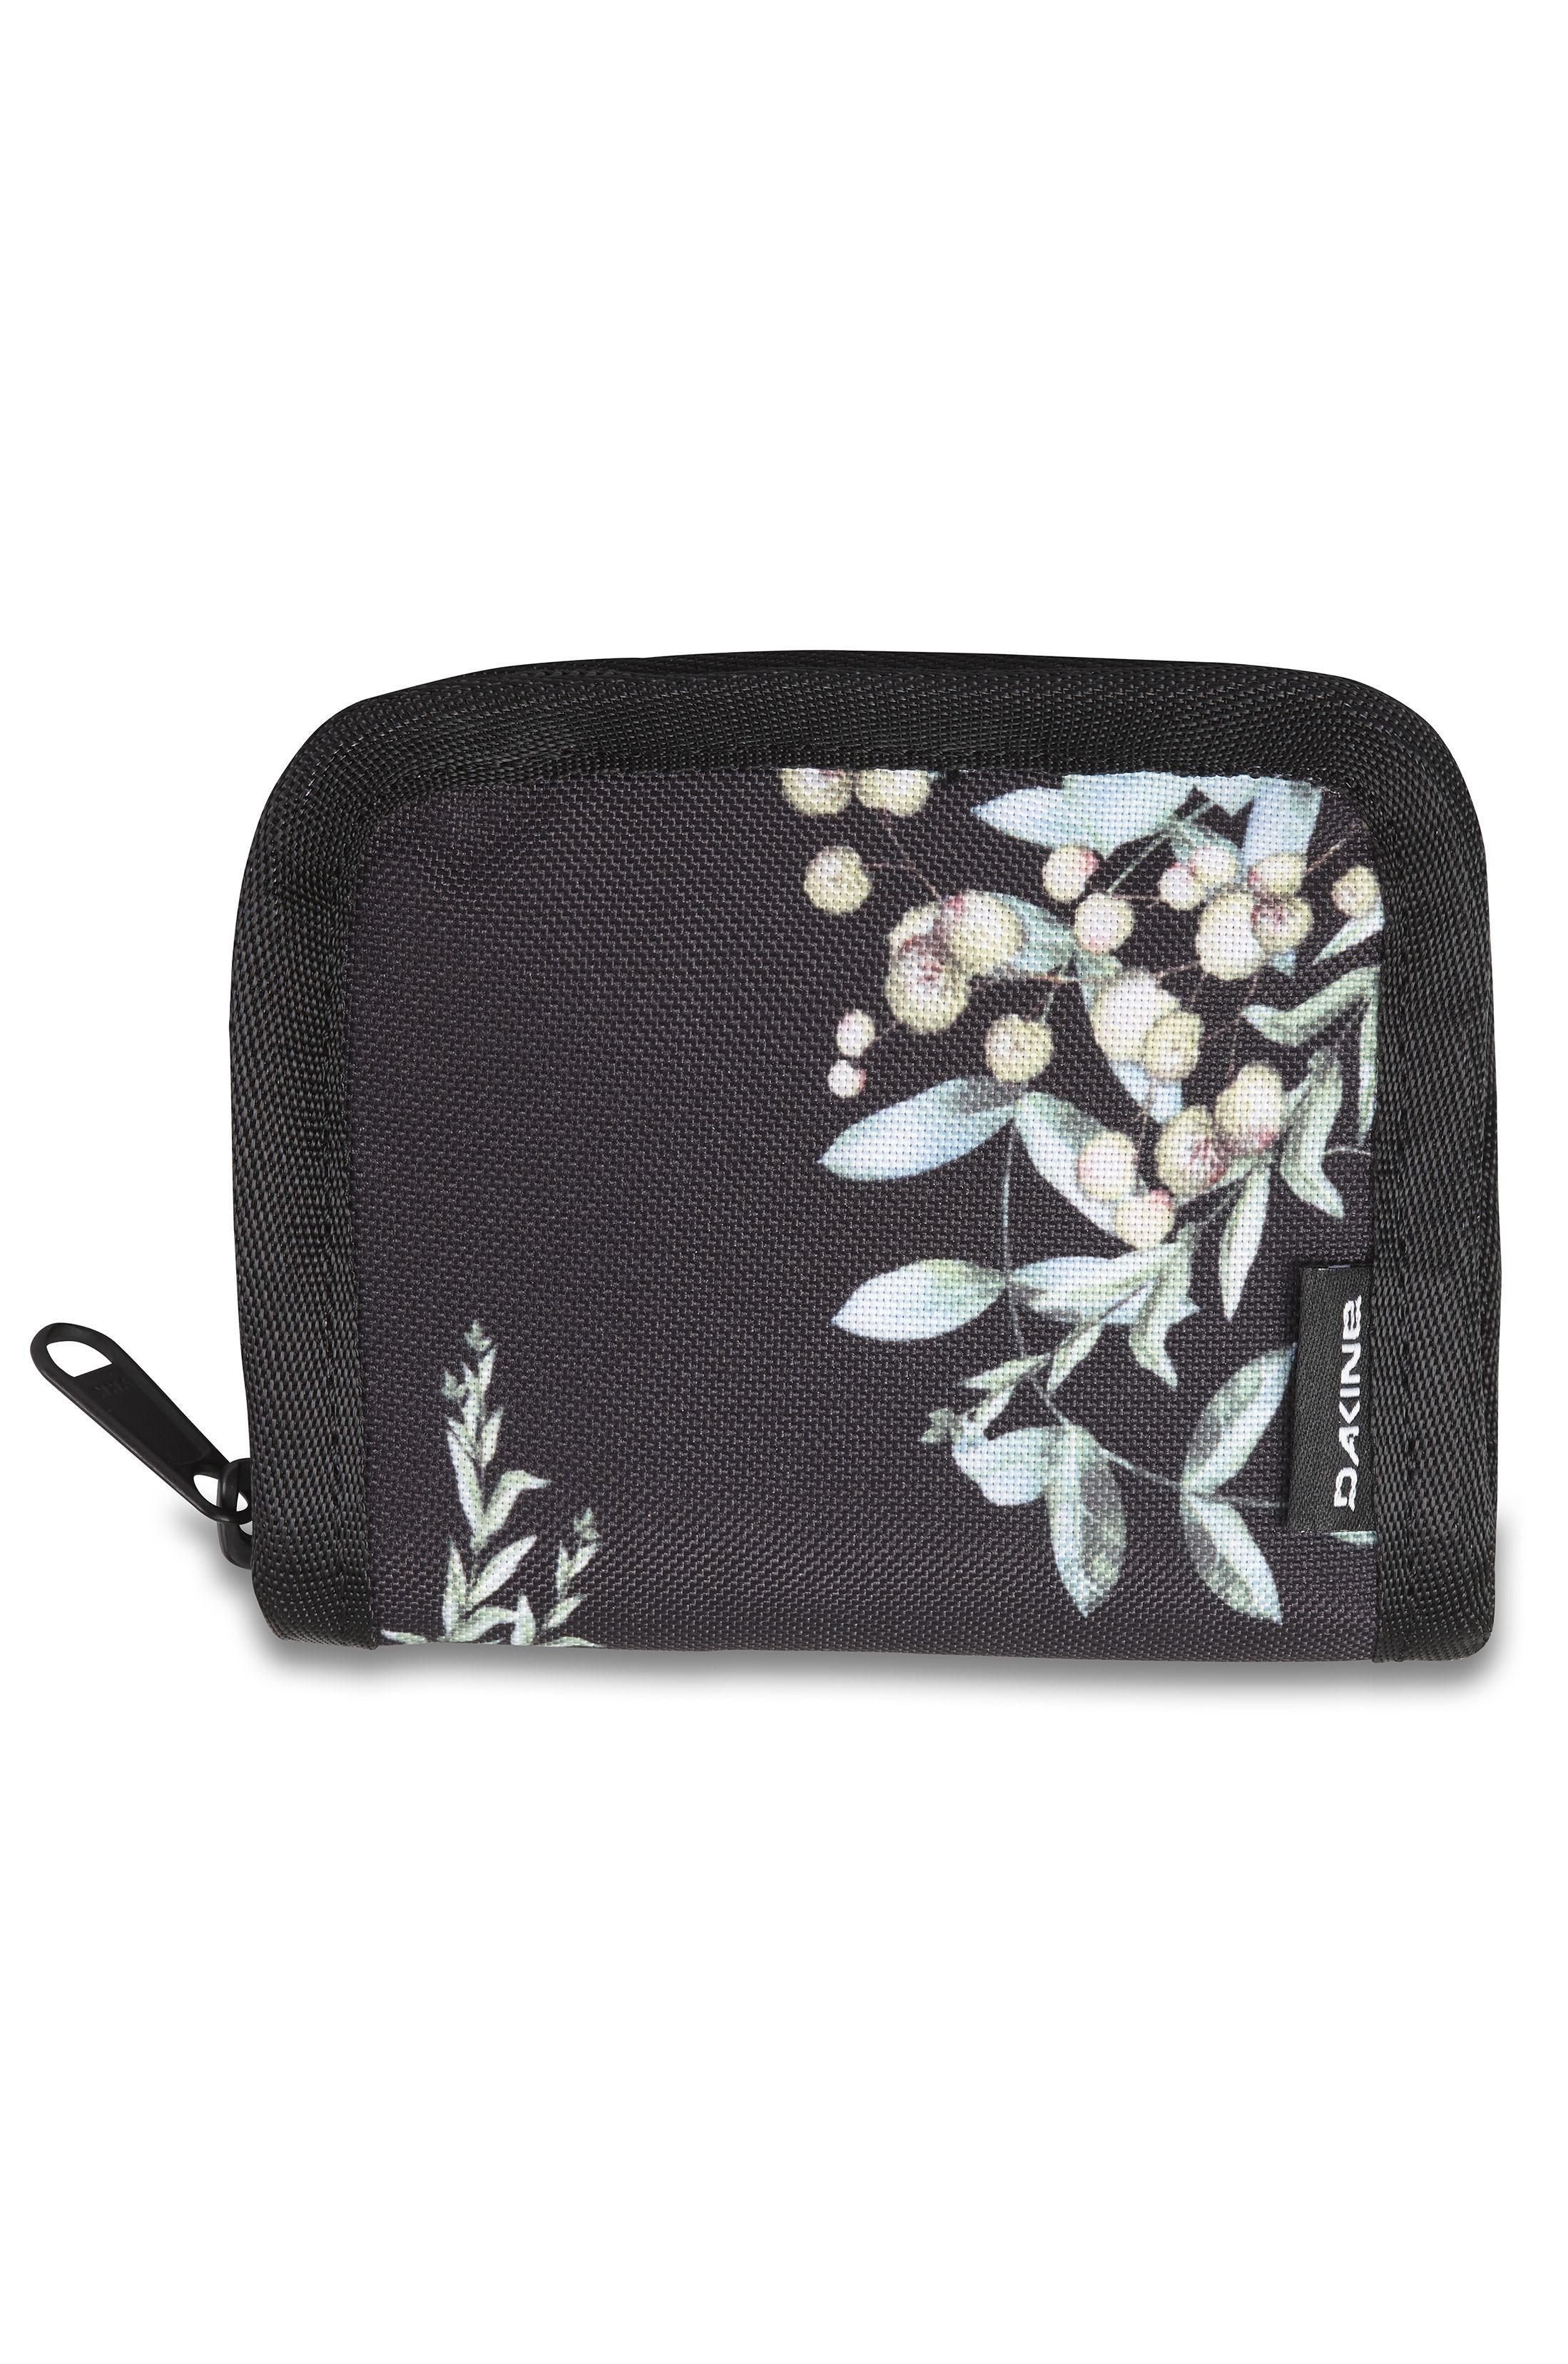 Dakine Wallet SOHO WALLET Solstice Floral